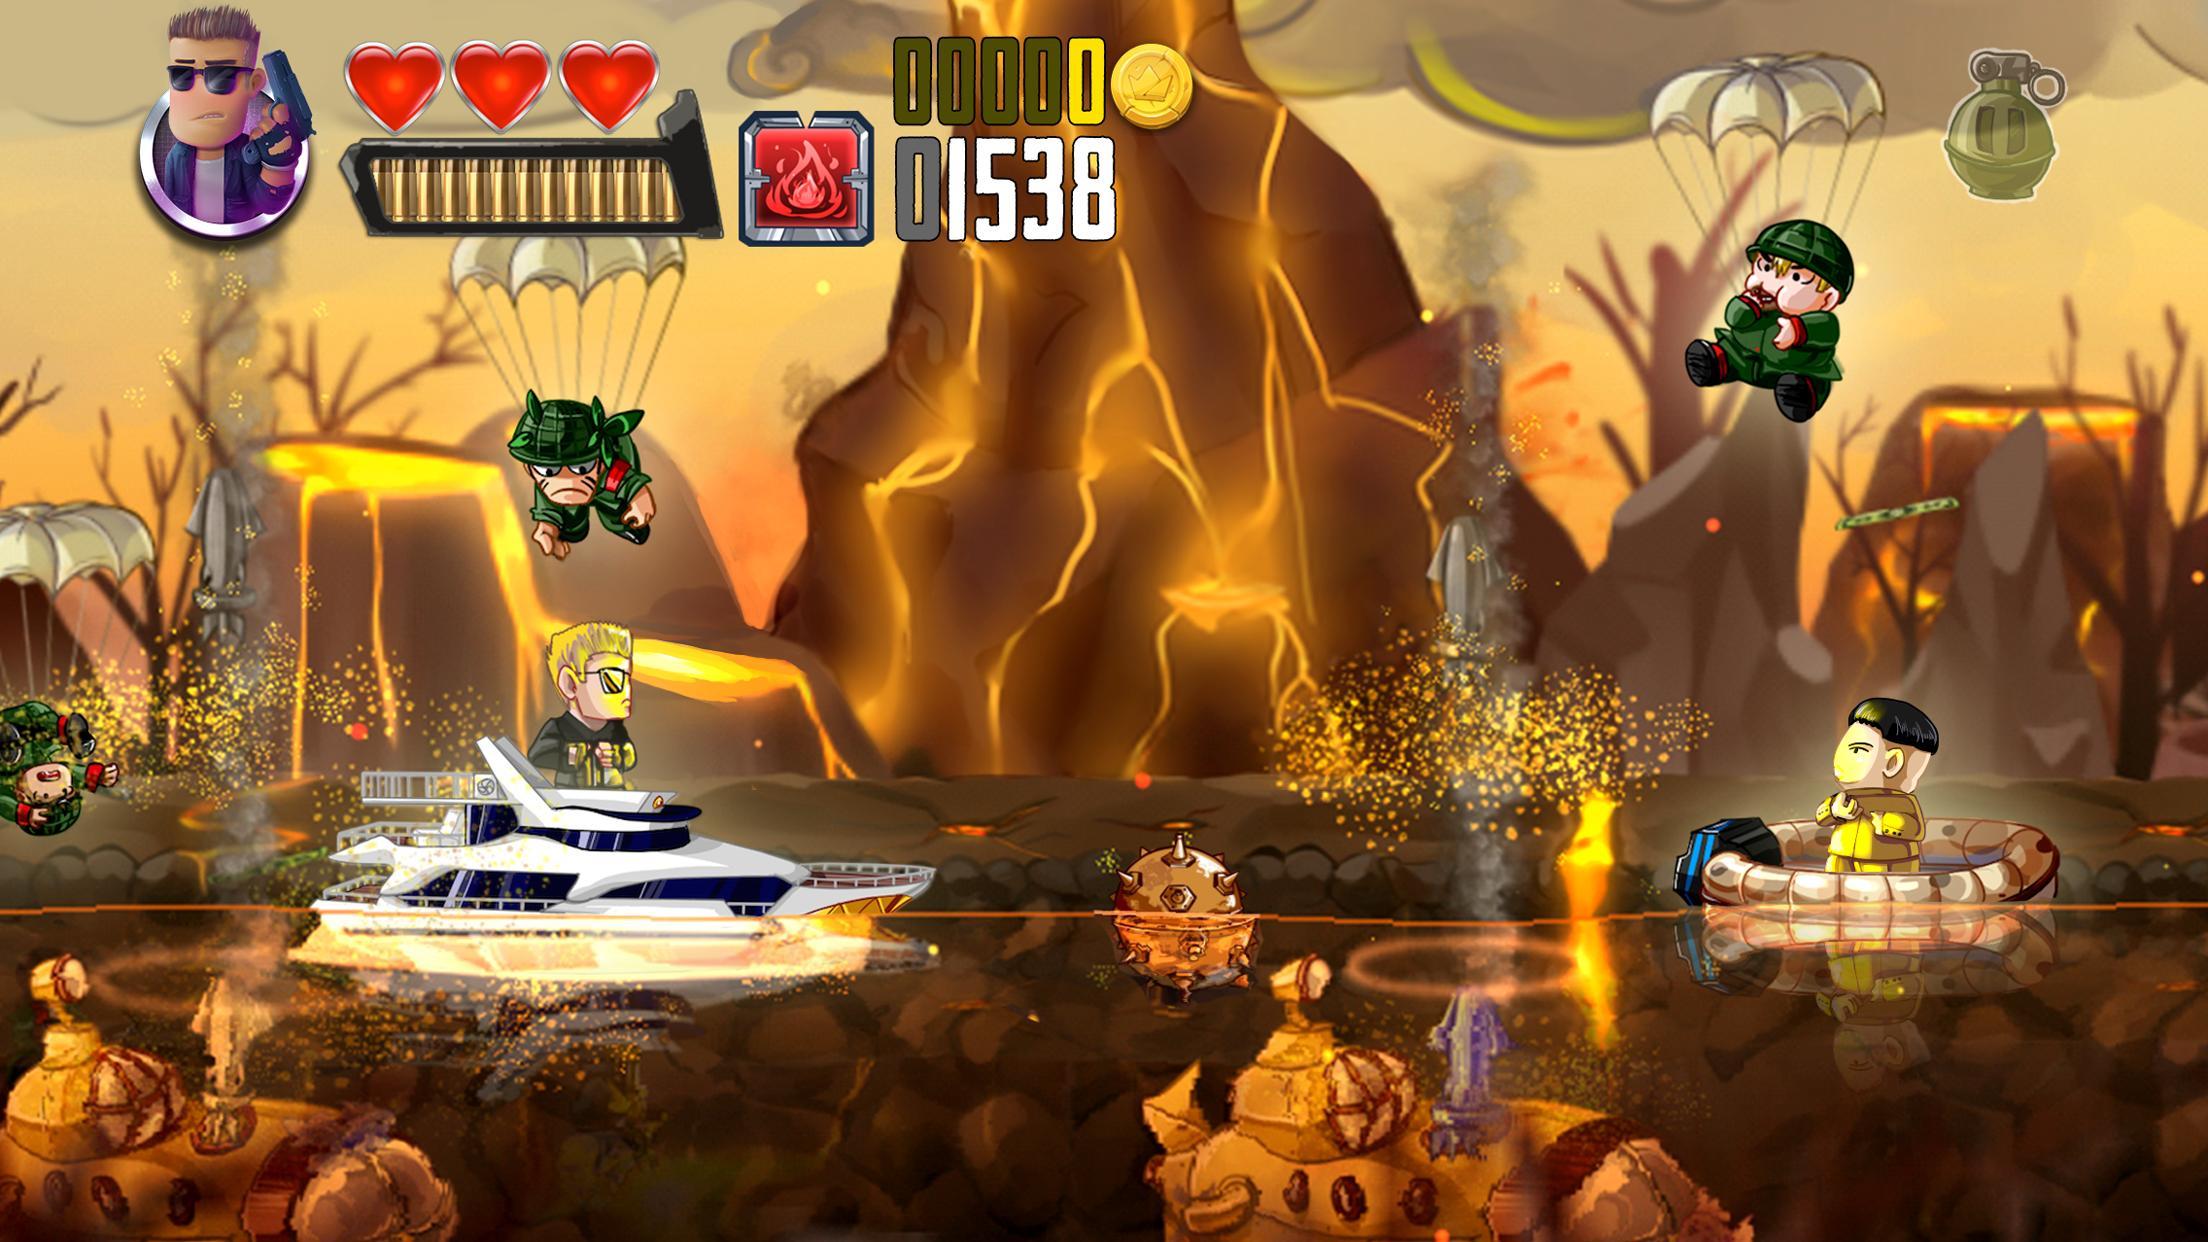 Ramboat Offline Jumping Shooter and Running Game 4.1.5 Screenshot 14